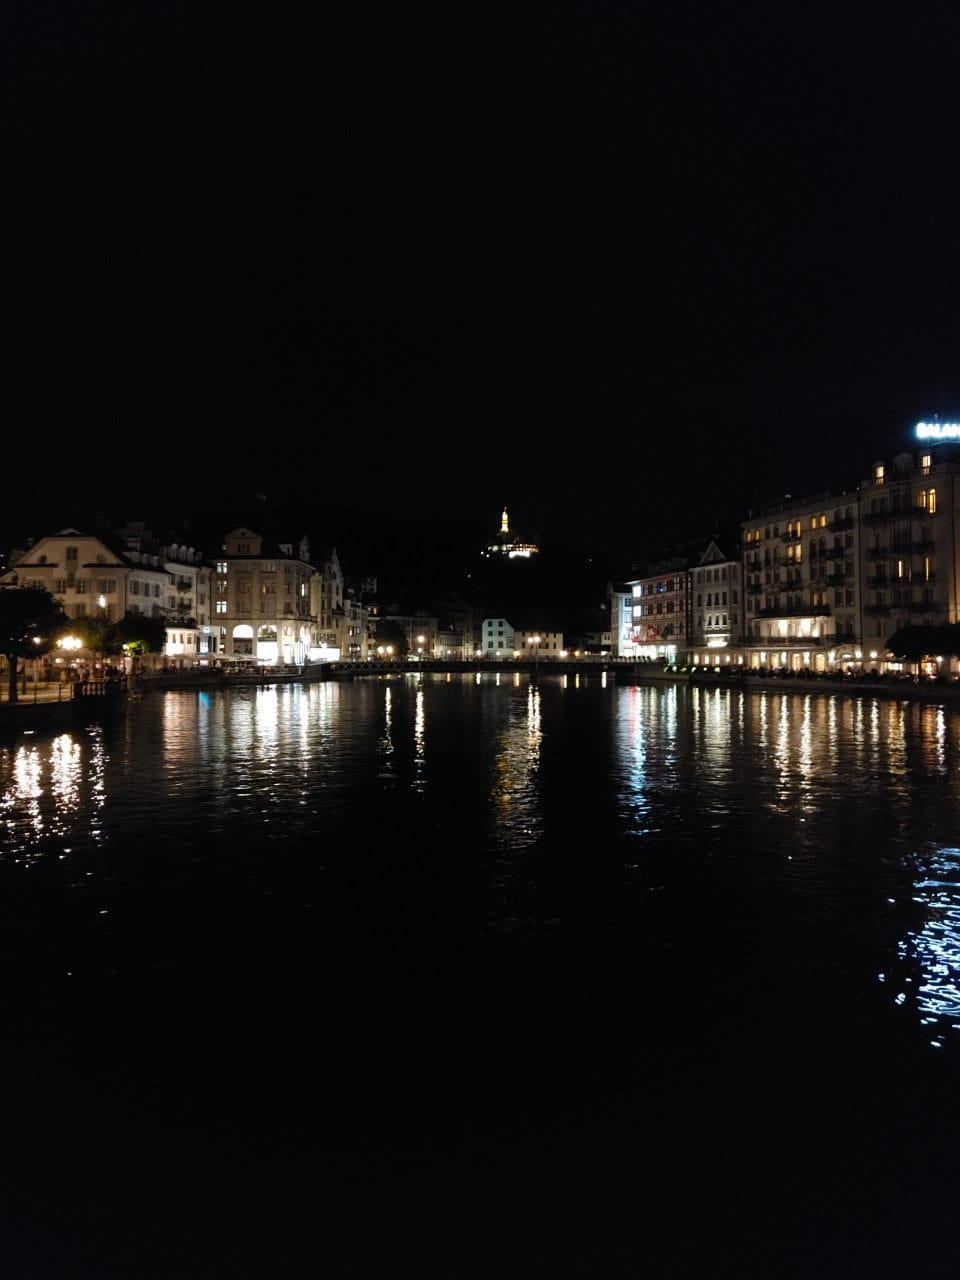 LG Vevlet Nachtaufnahme Luzern ohne Nachtmodus